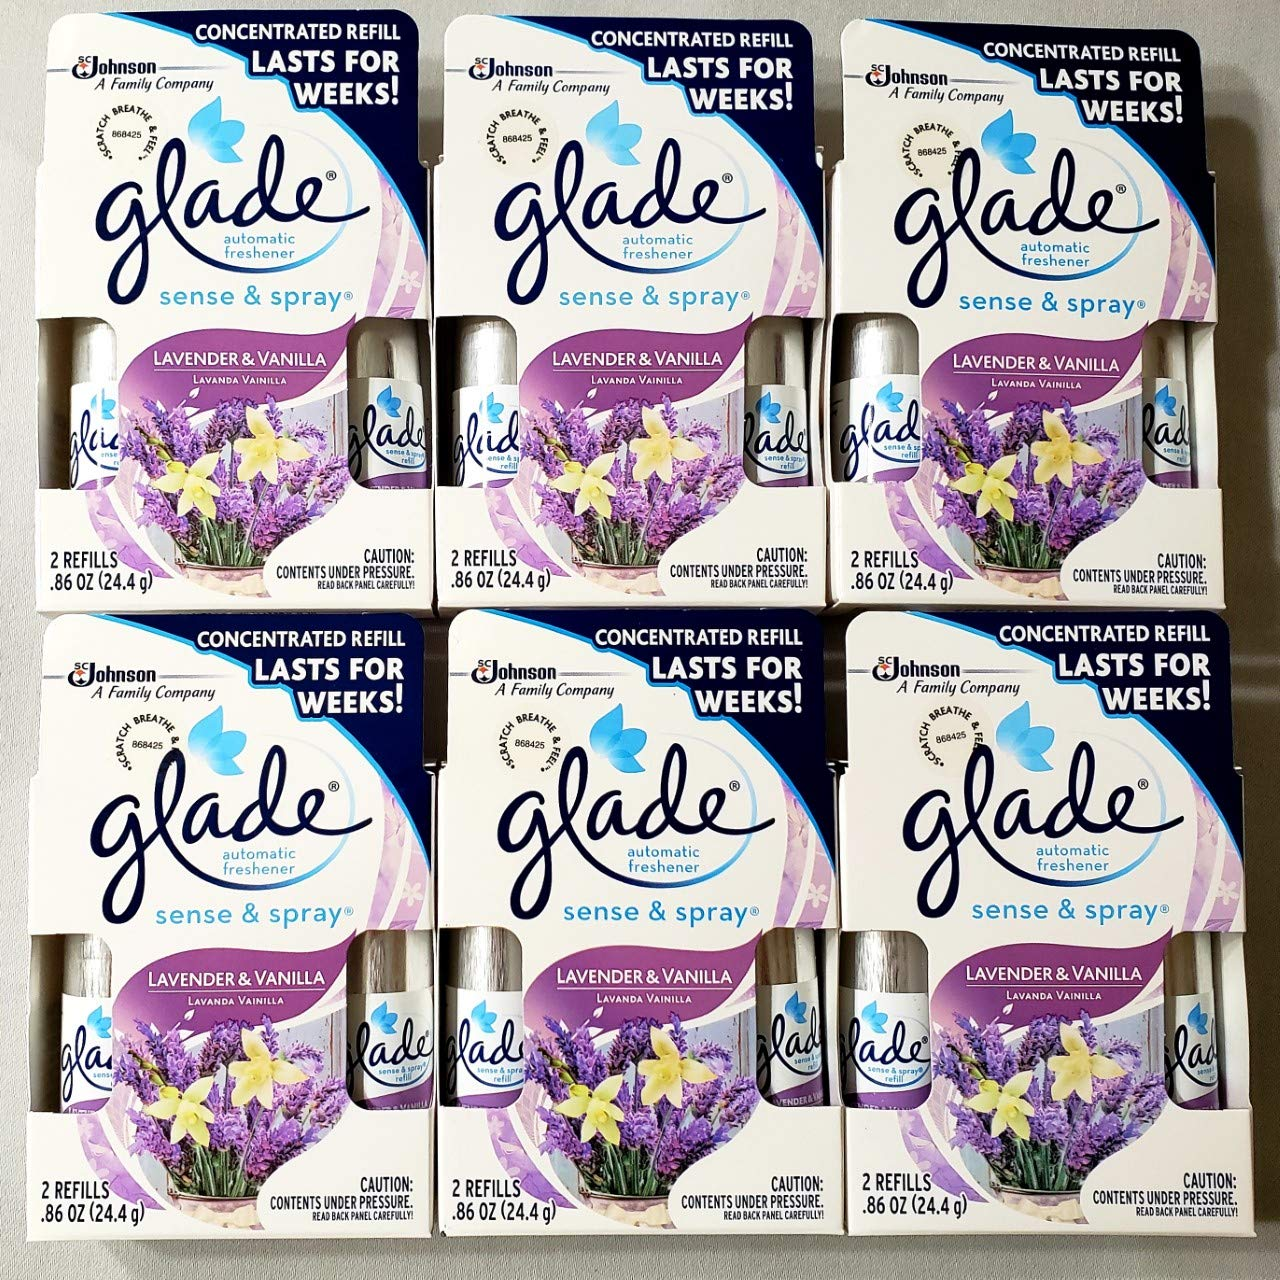 12 Glade Sense & Spray Automatic Freshener Refill Lavender & Vanilla (6 Twin Pack) by Glade